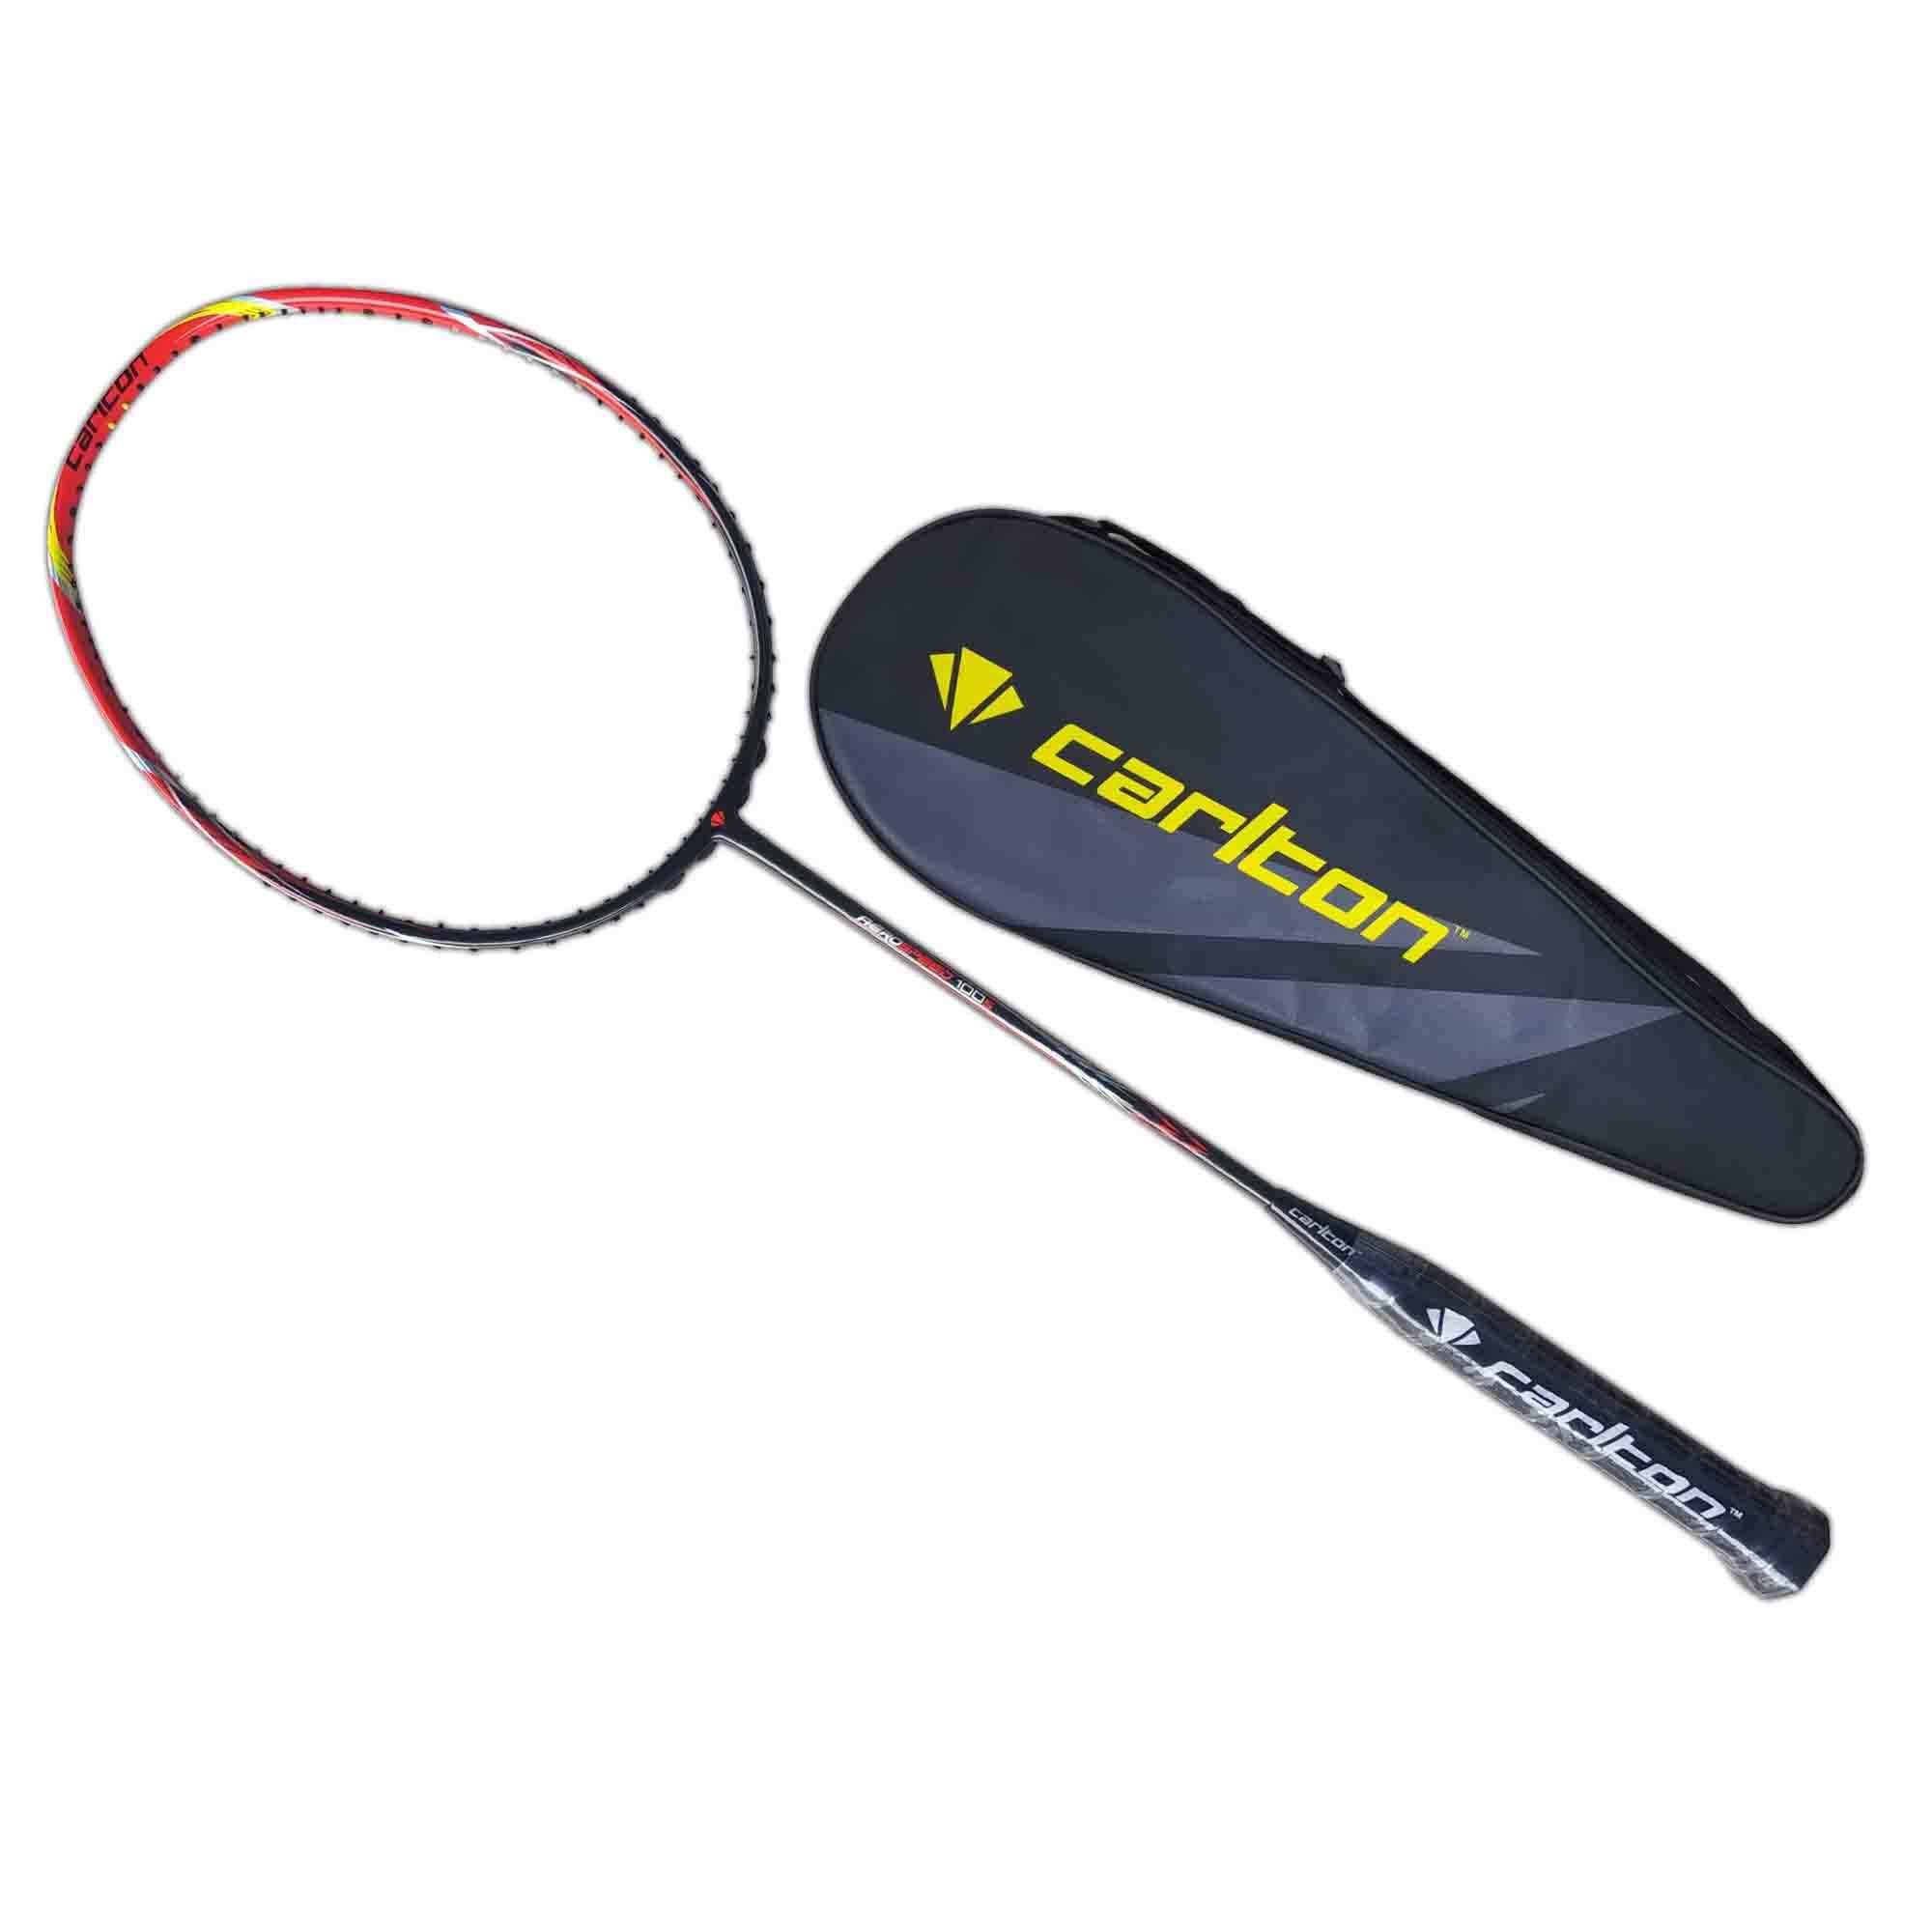 Carlton Badminton Racket Aerospeed 100S